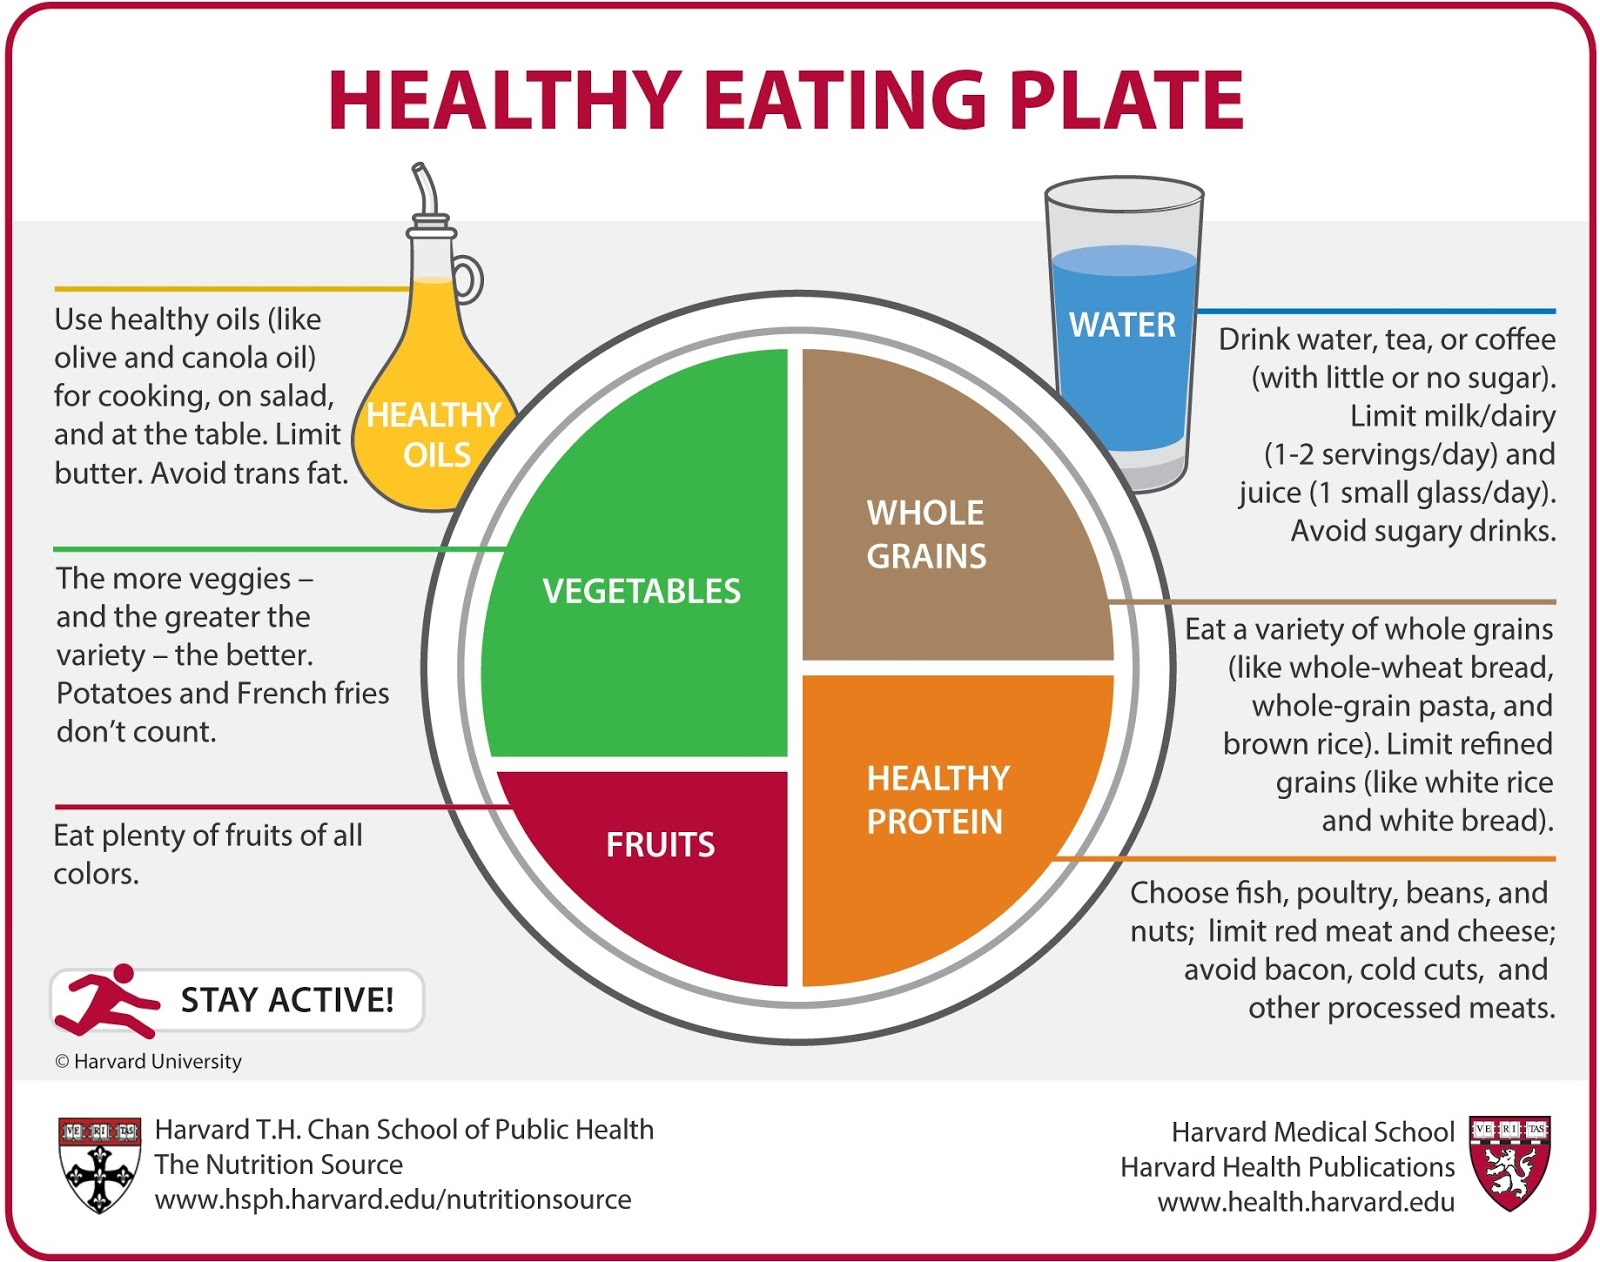 Menu Makanan Untuk Diet Menurunkan Berat Badan Rendah Kalori Dan